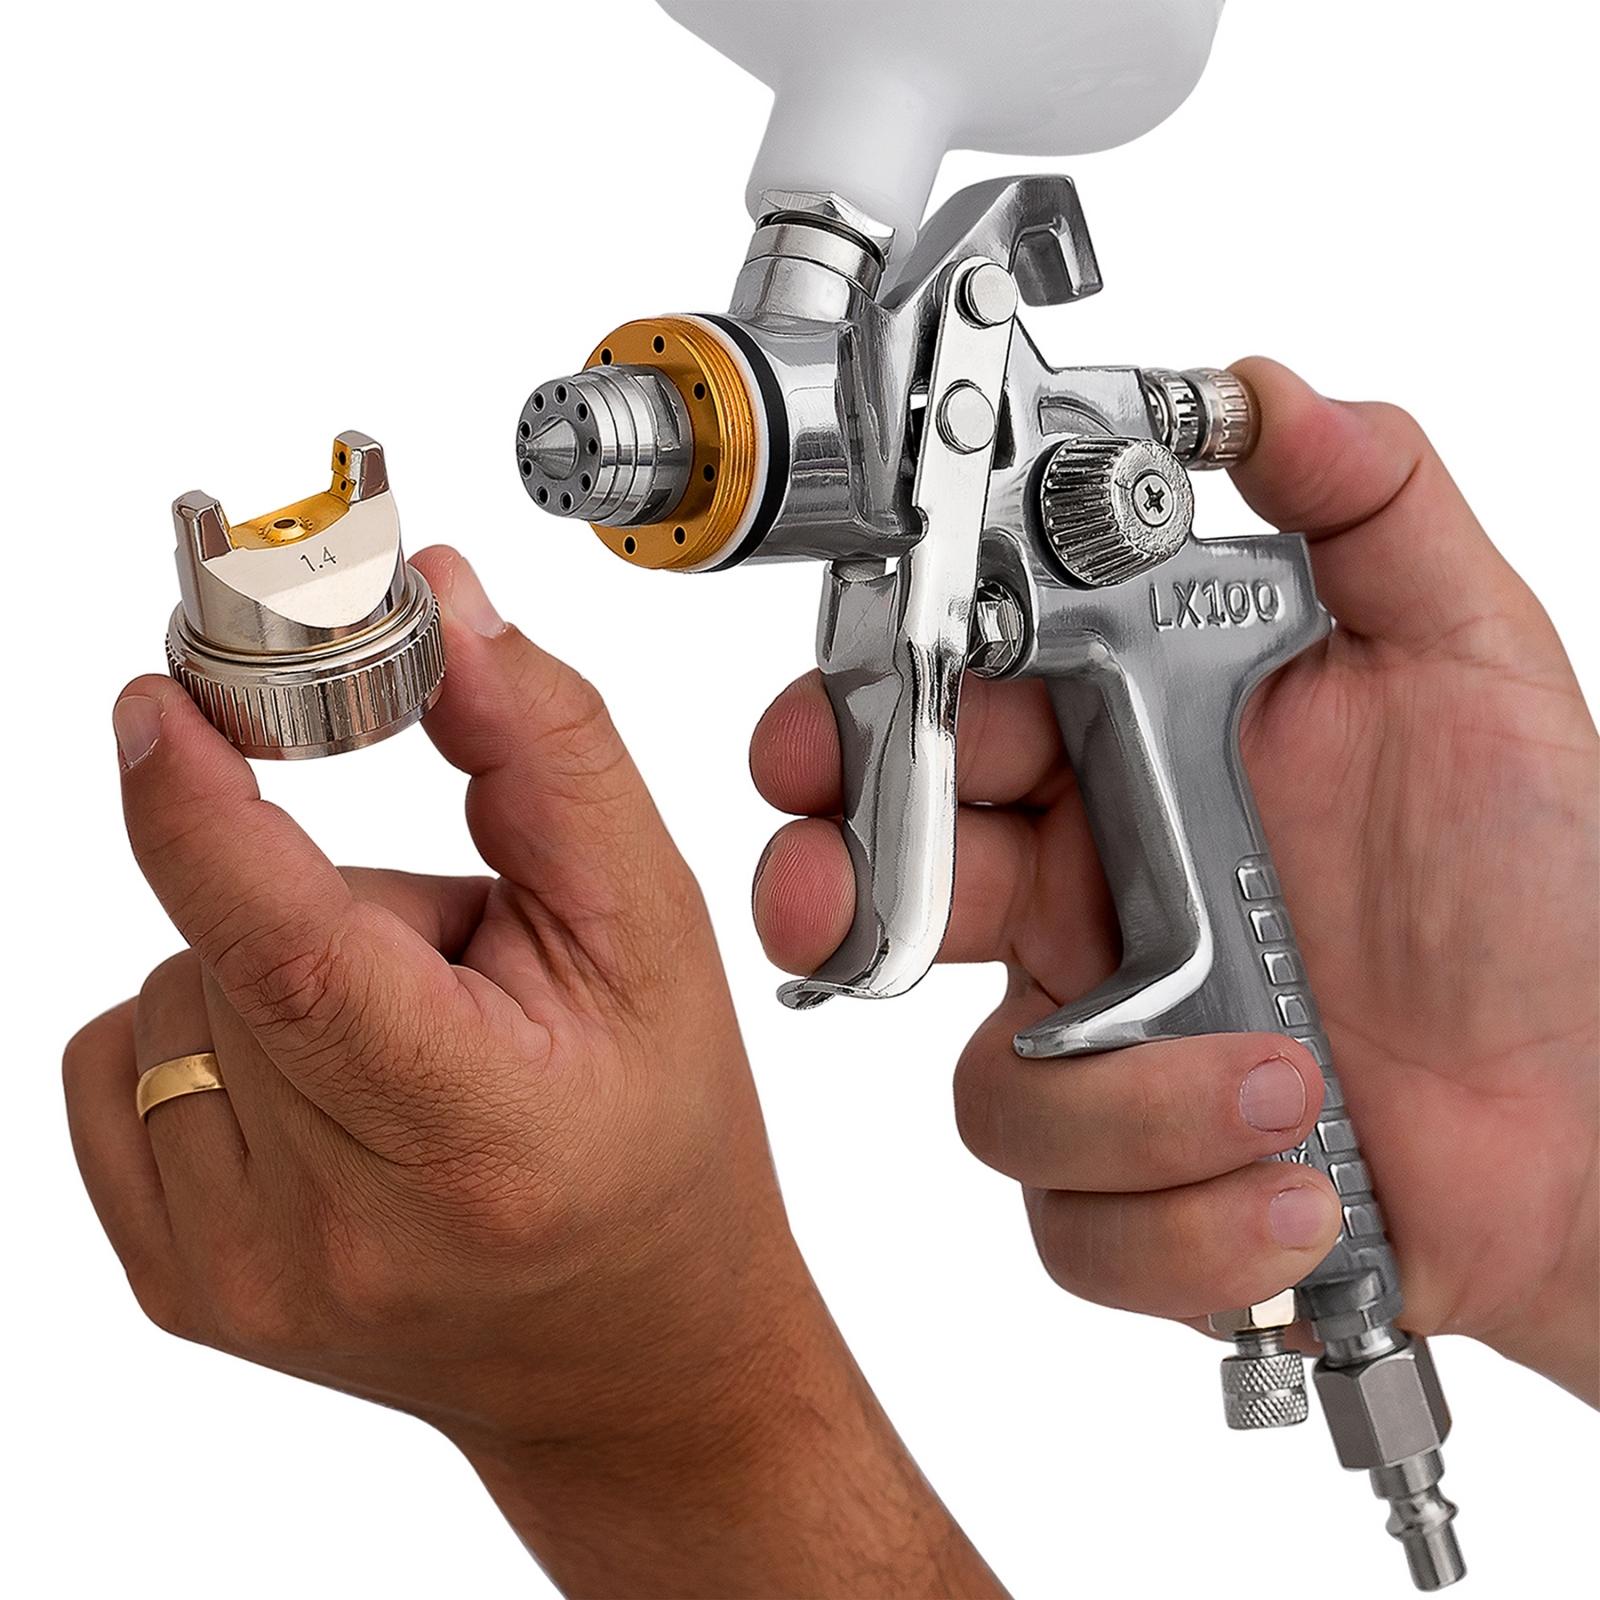 Pistola De Pintura Automotiva Hvlp Bico 1,4mm 600ml Lx100 - Ferramentas MEP